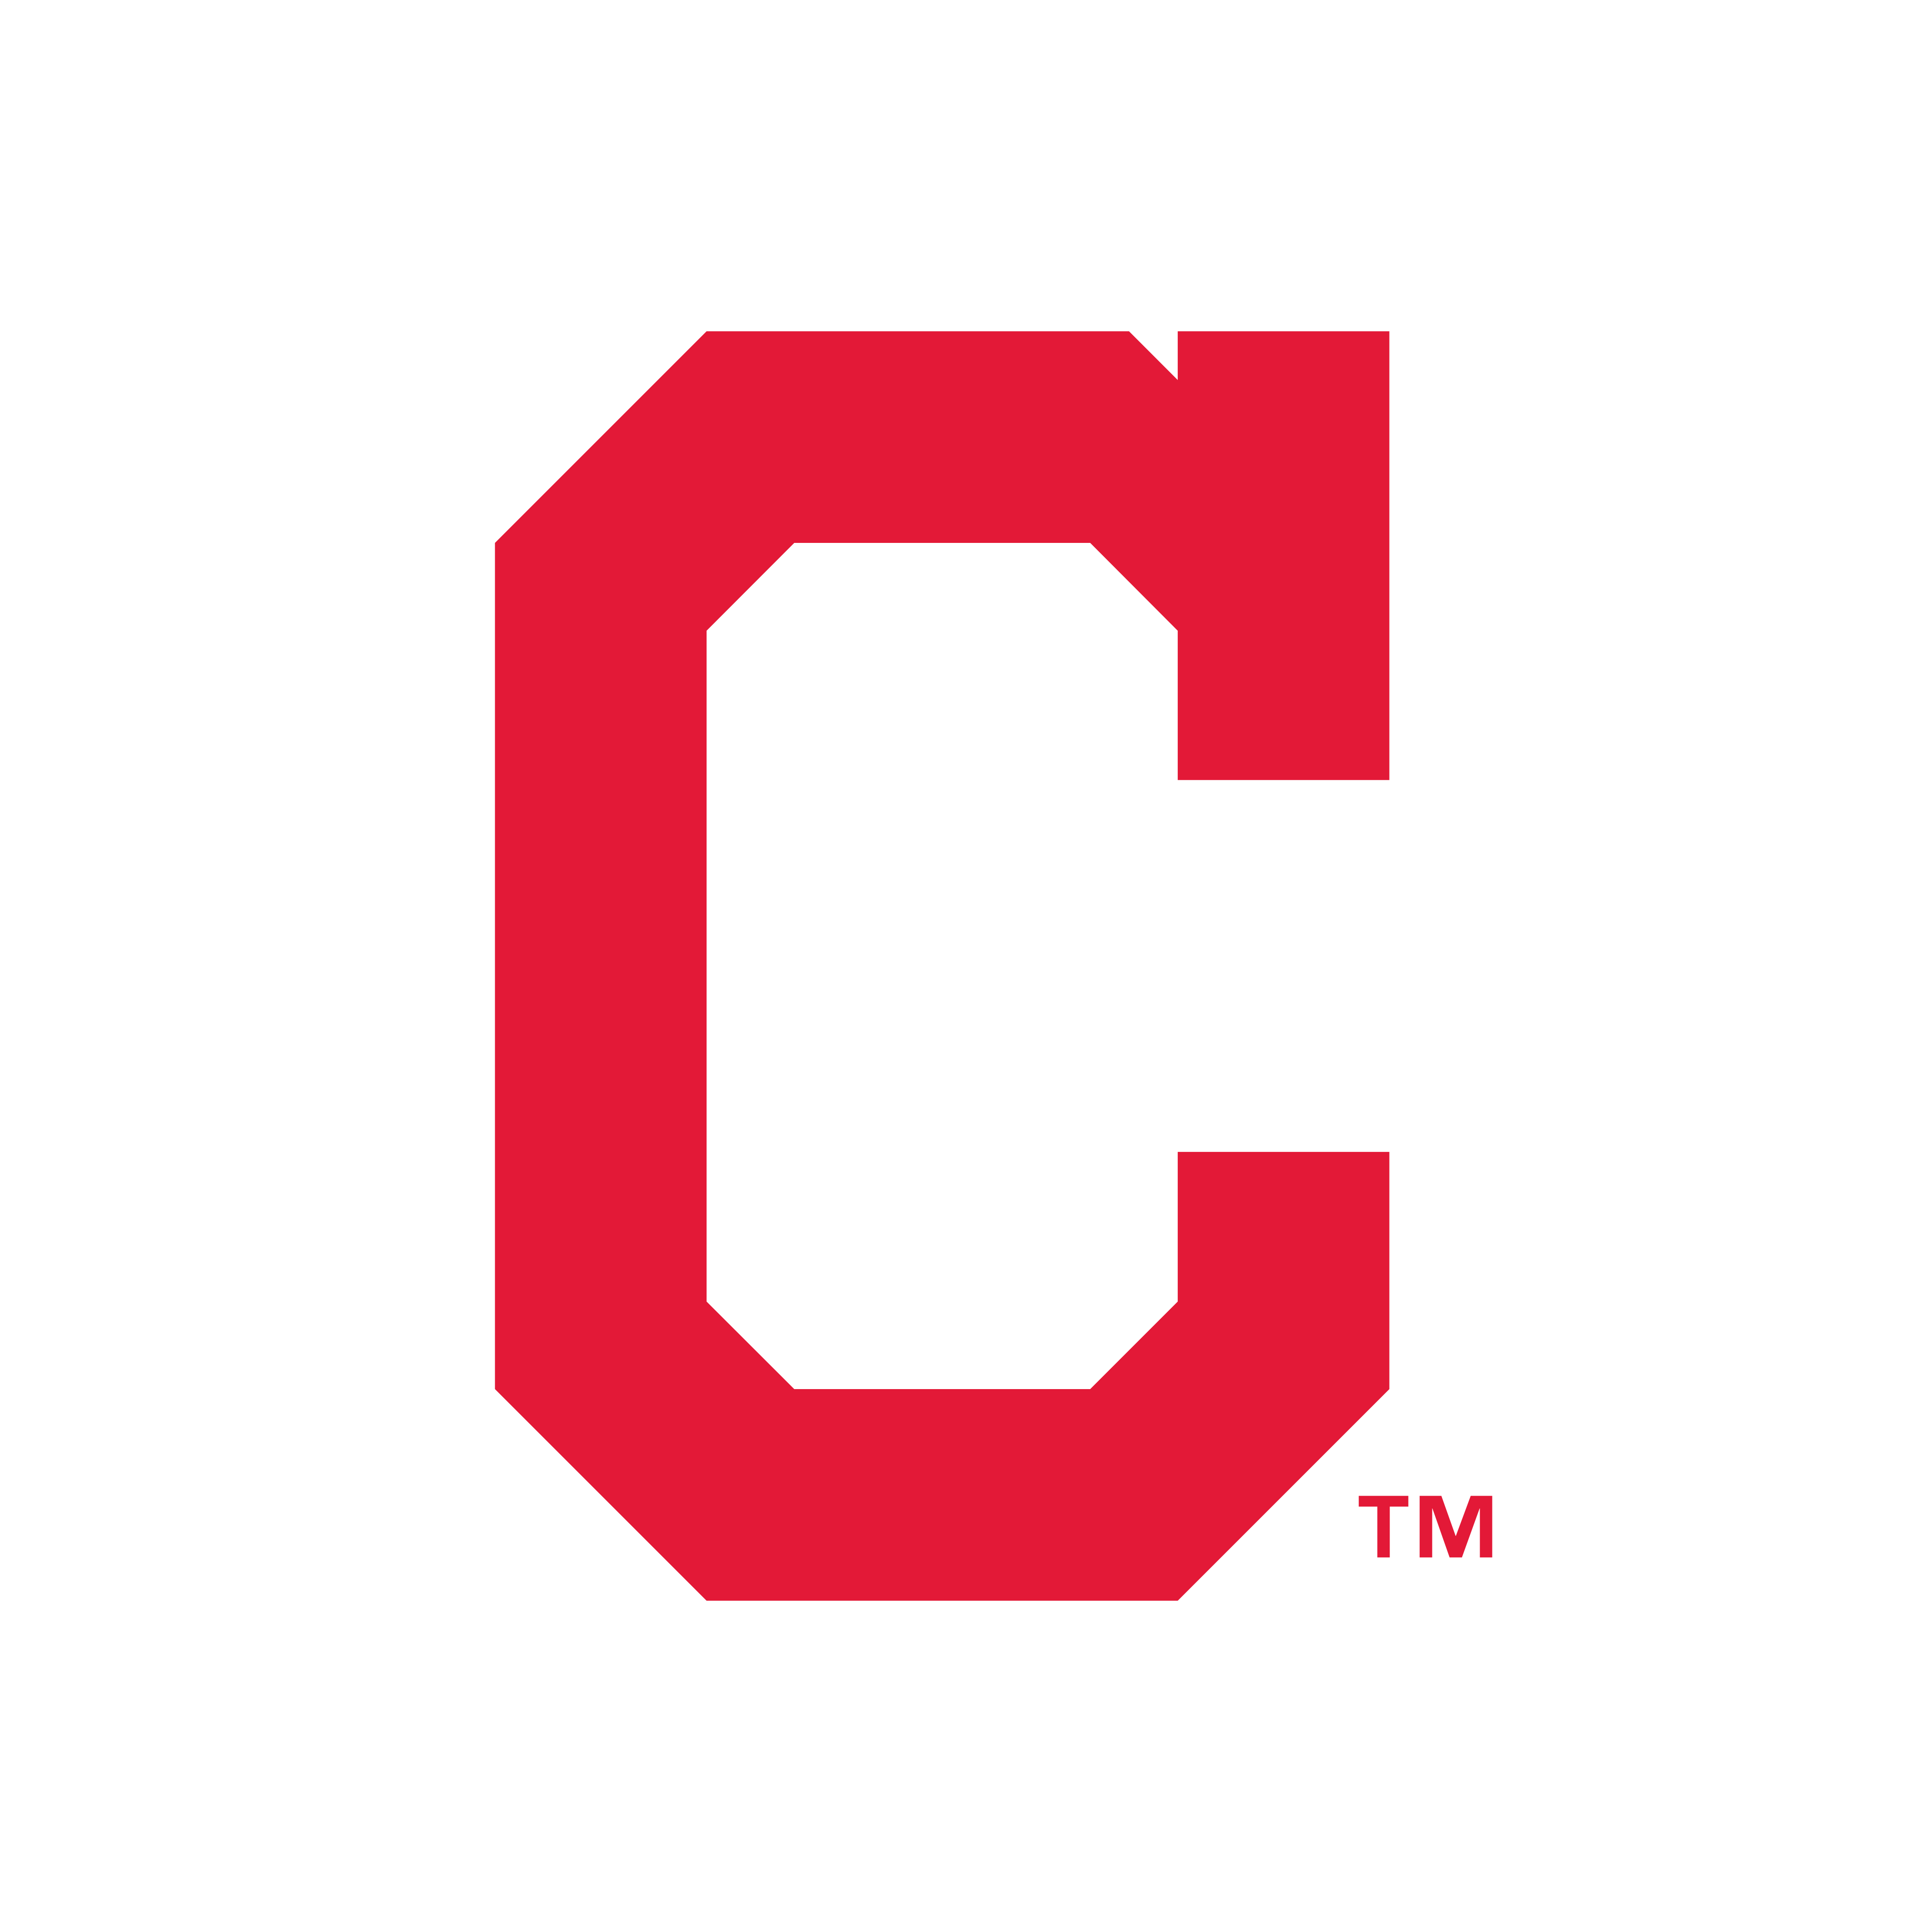 cleveland indians logo 0 - Cleveland Indians Logo